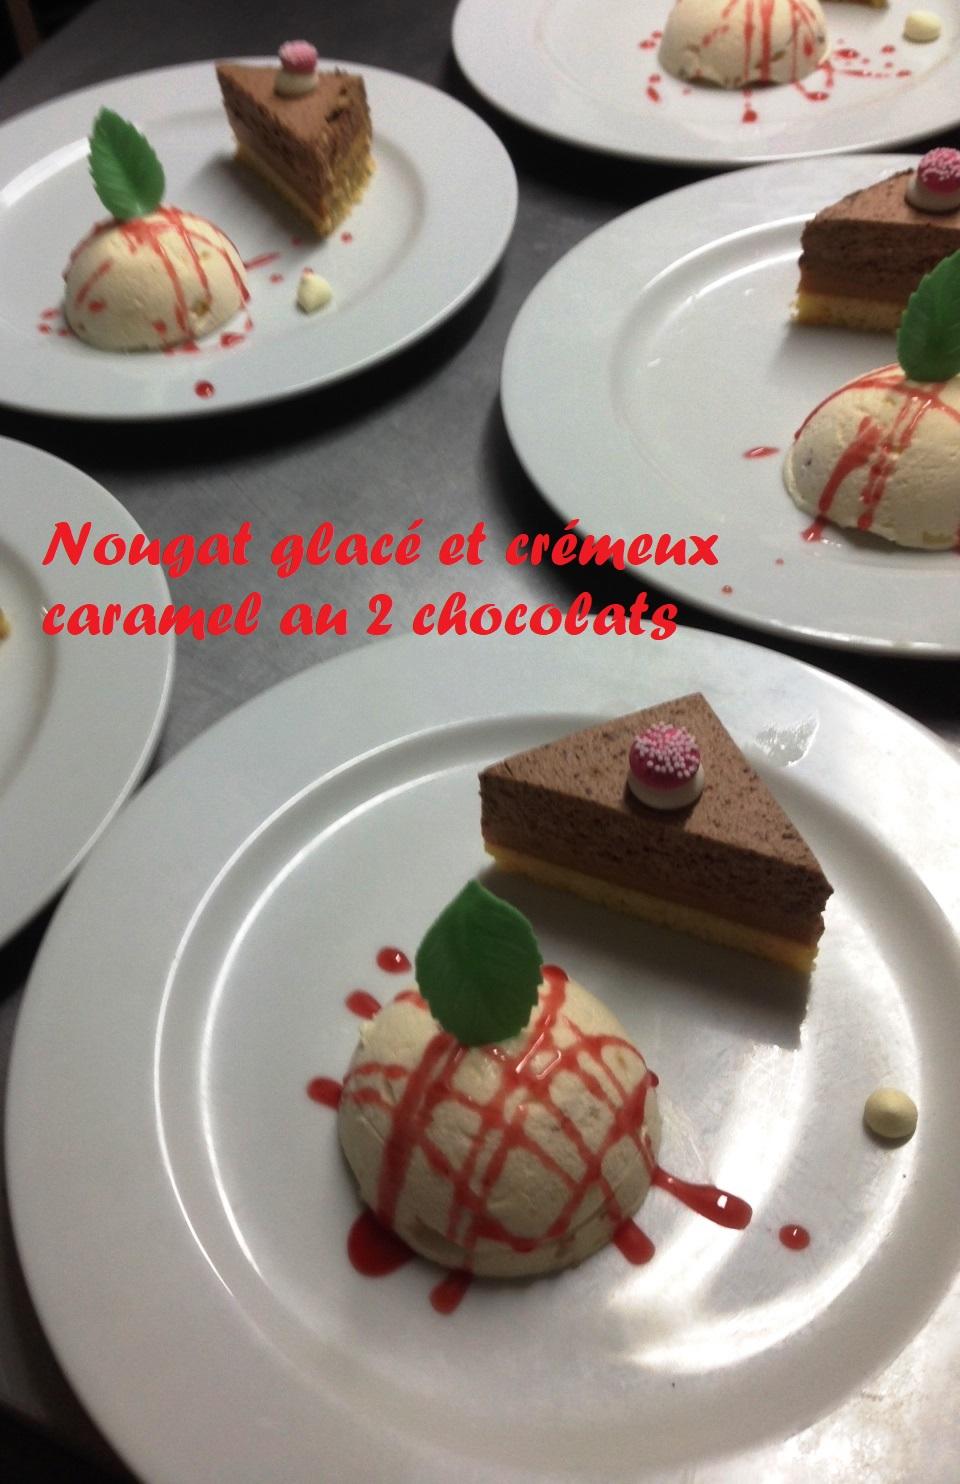 IMG_0687 cremeux caramel chocolat et nougat glacé